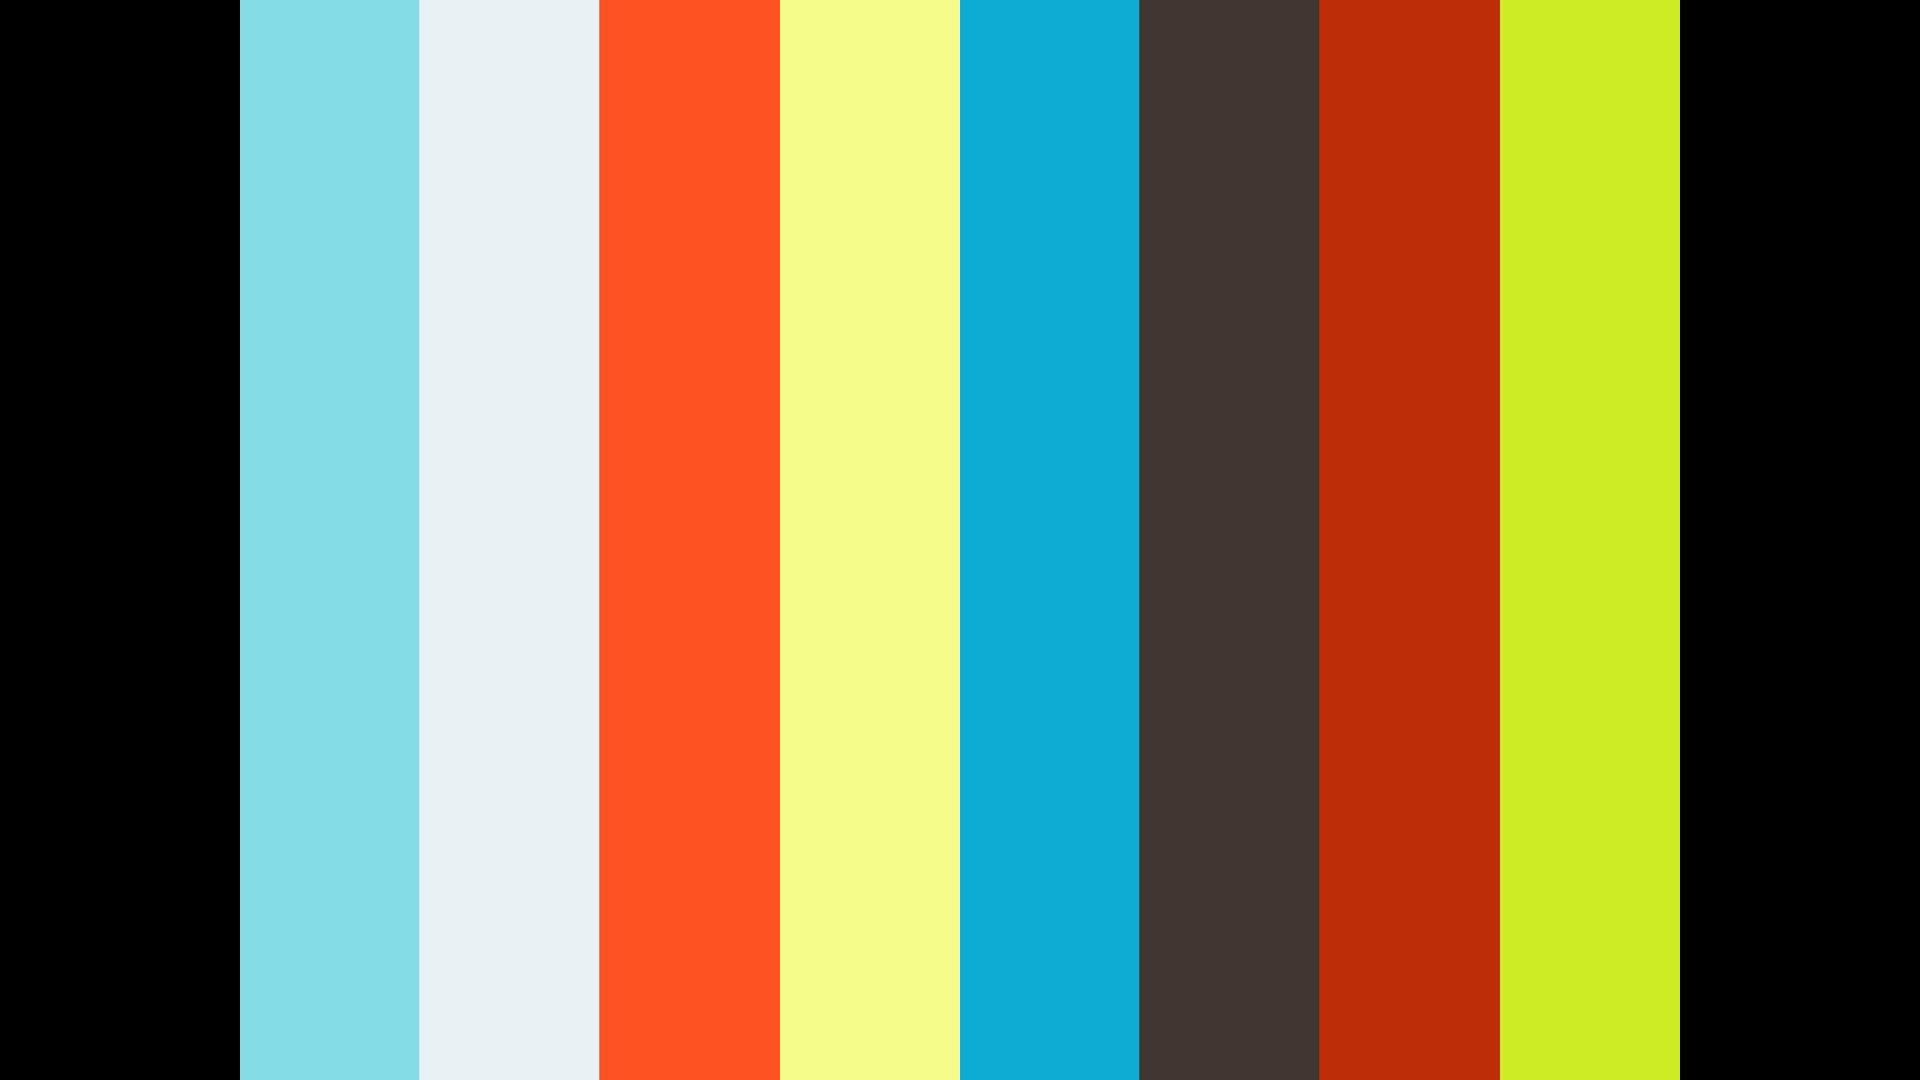 Spectrum: Embracing Gender